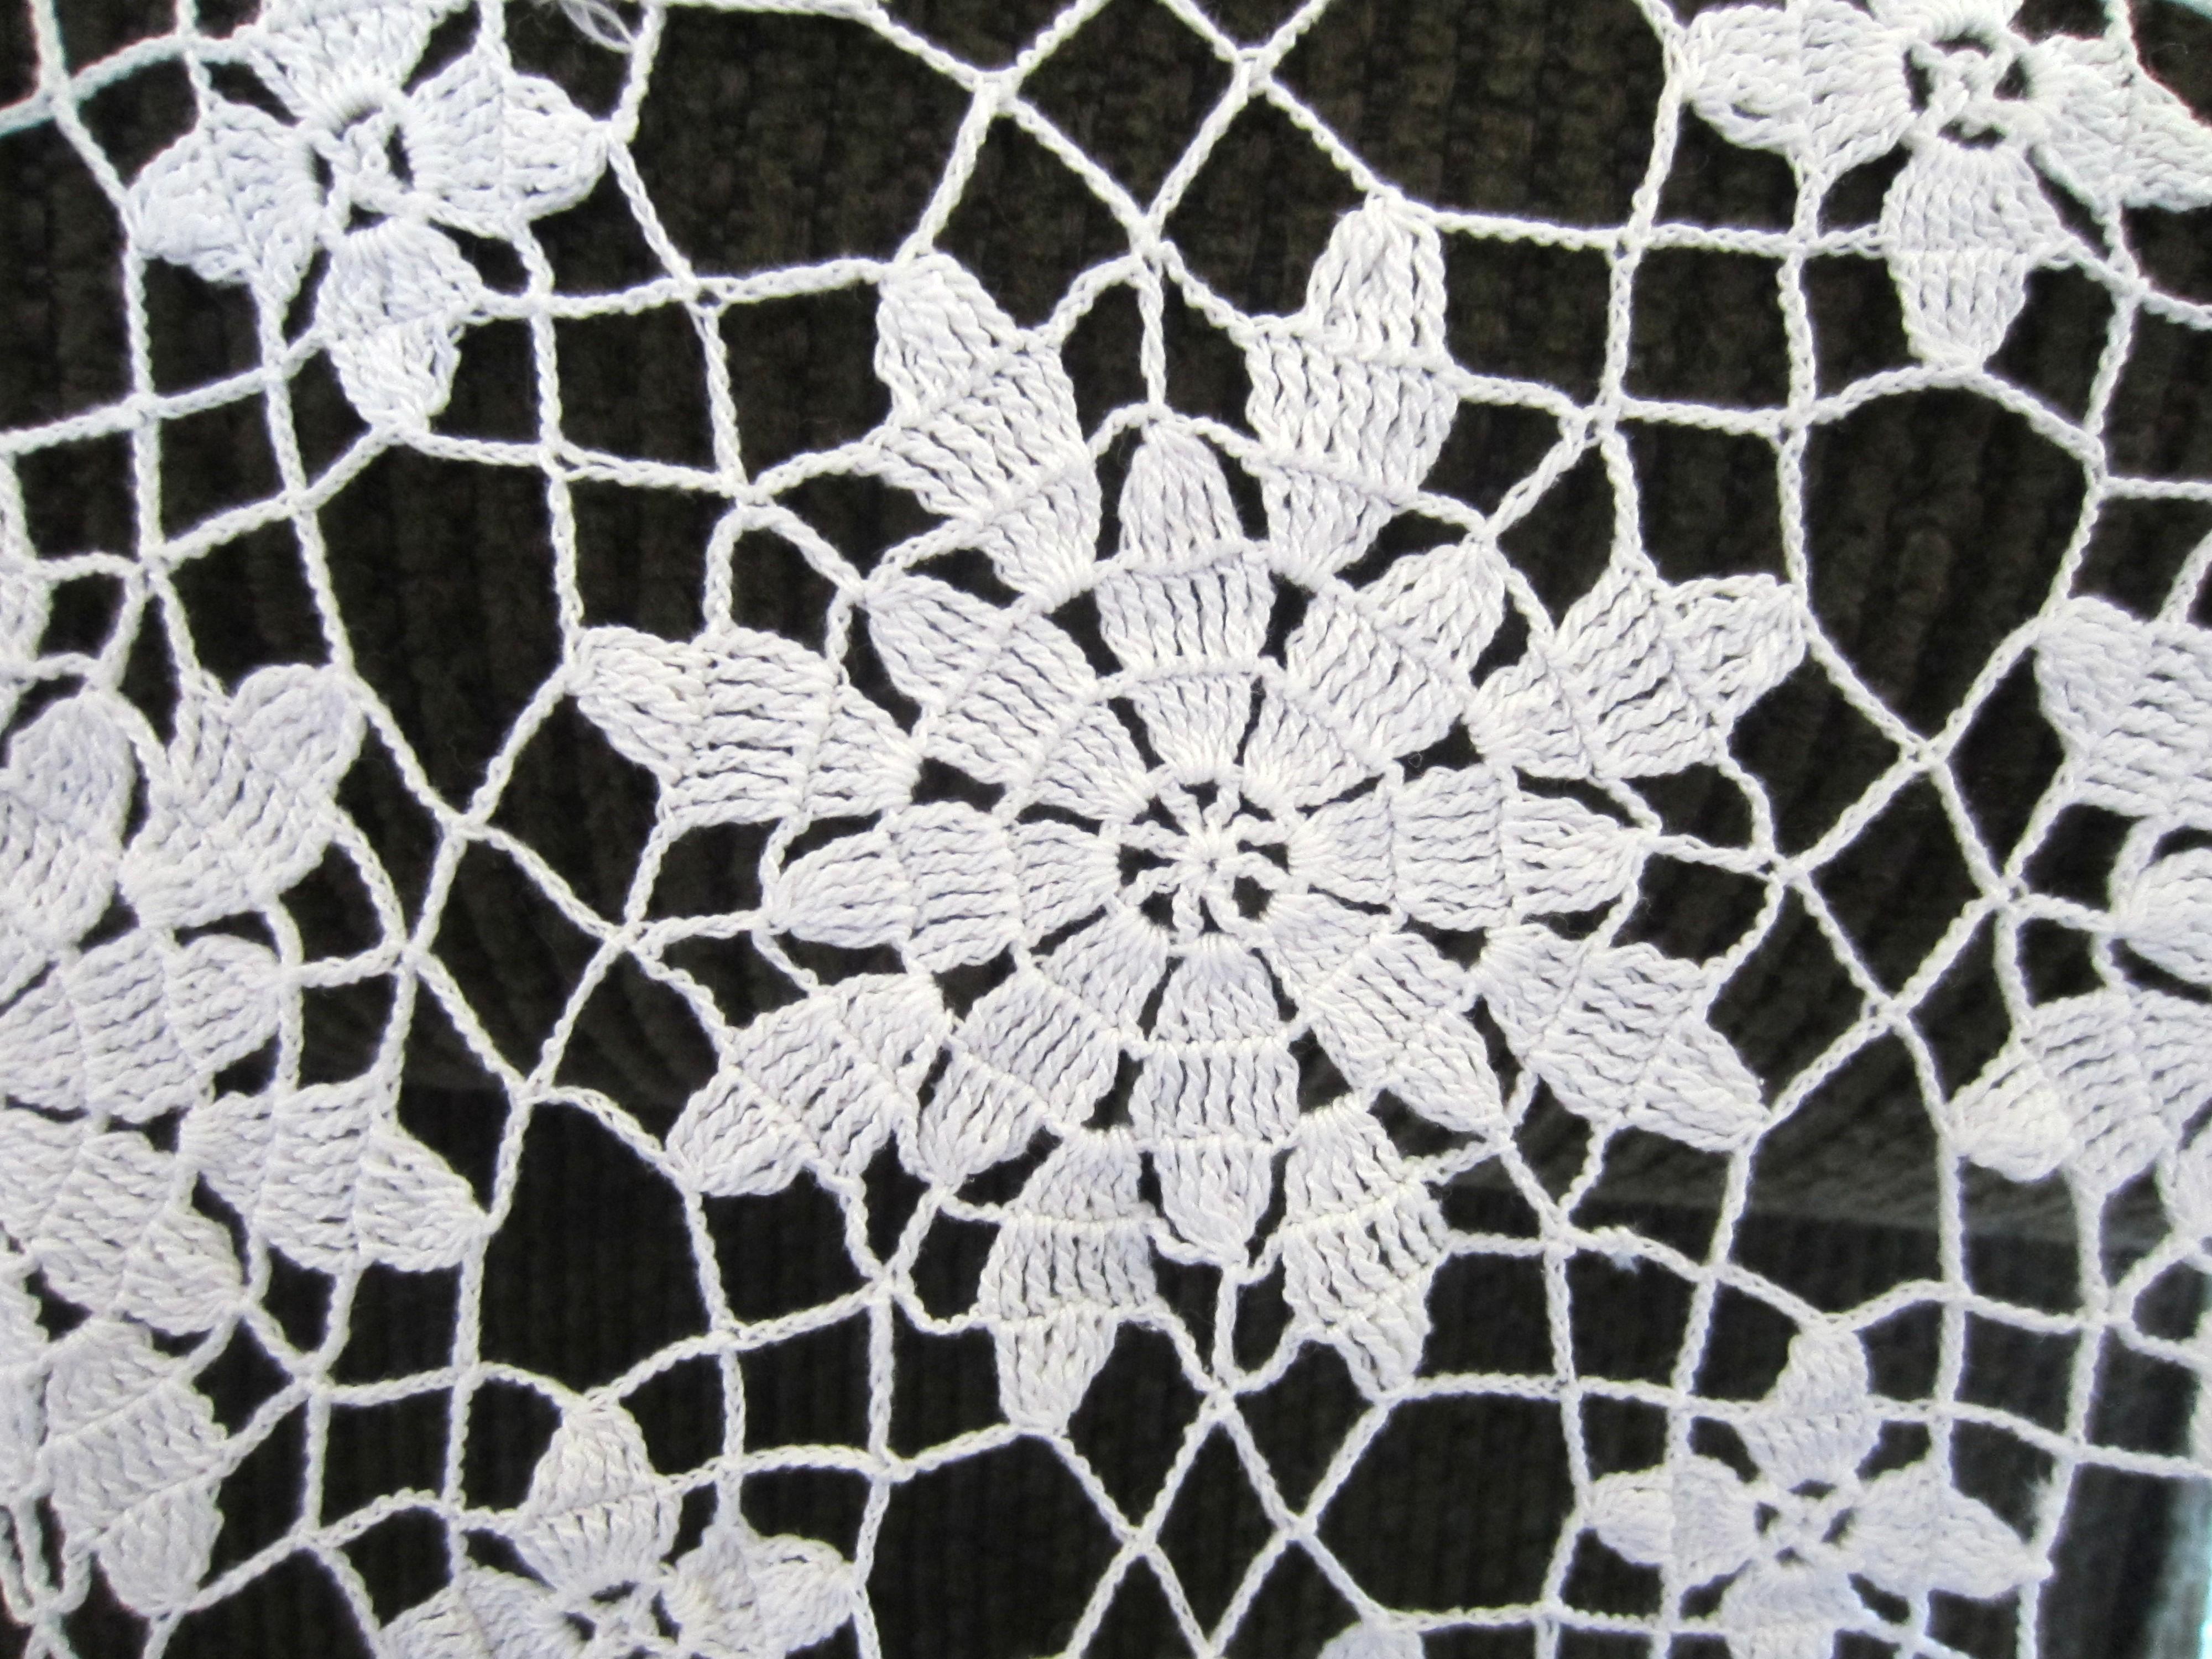 my grandmother s crochet floral motif tablecloth g. Black Bedroom Furniture Sets. Home Design Ideas